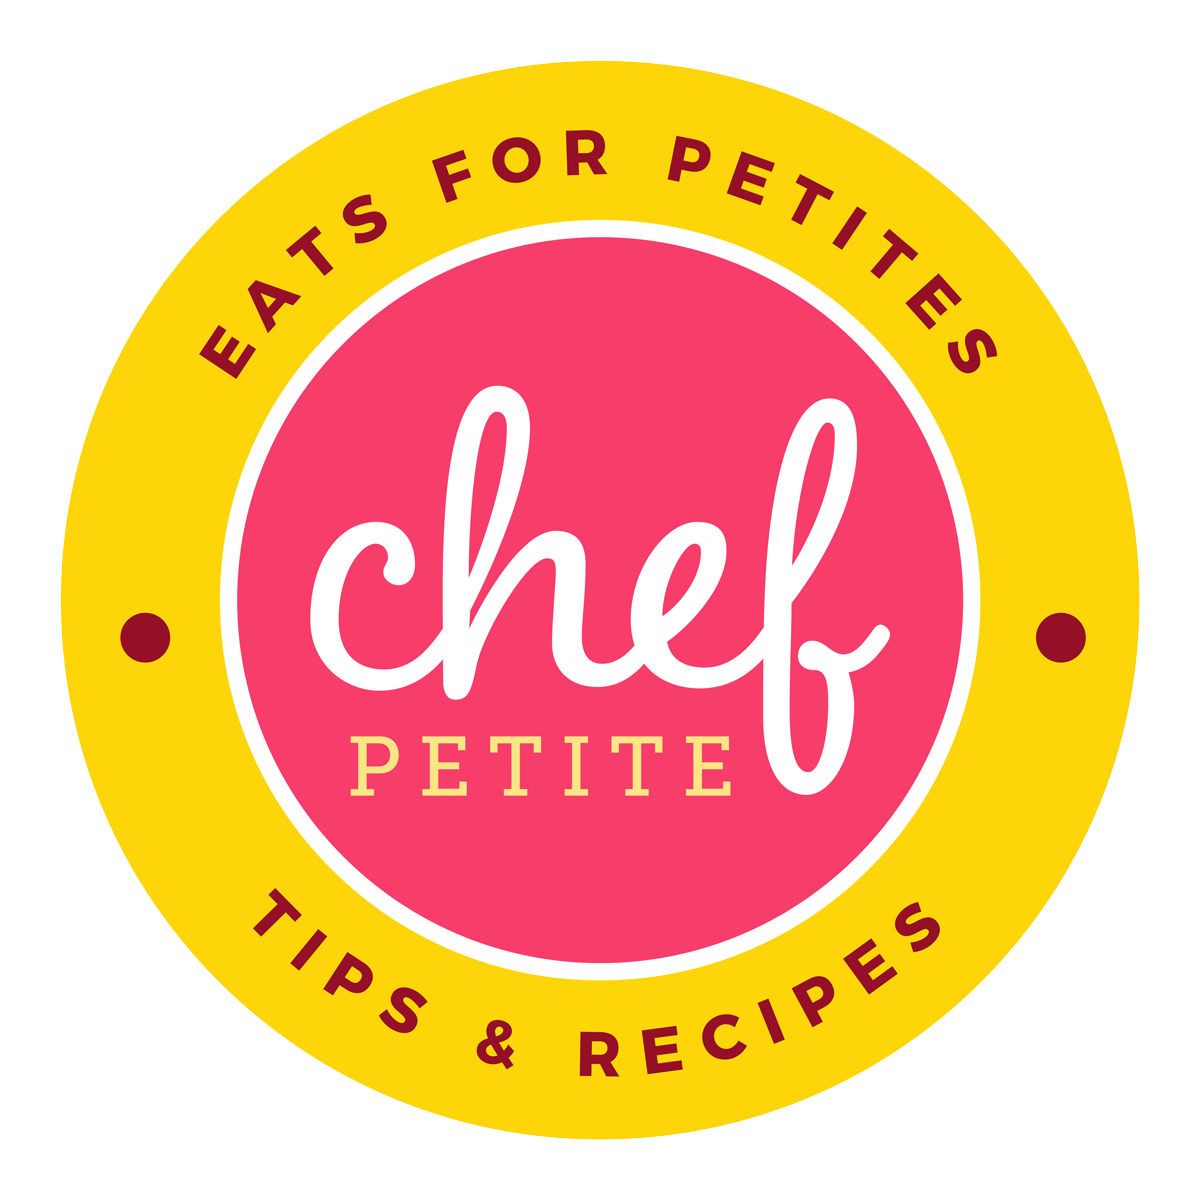 ChefPetite food blog logo and branding